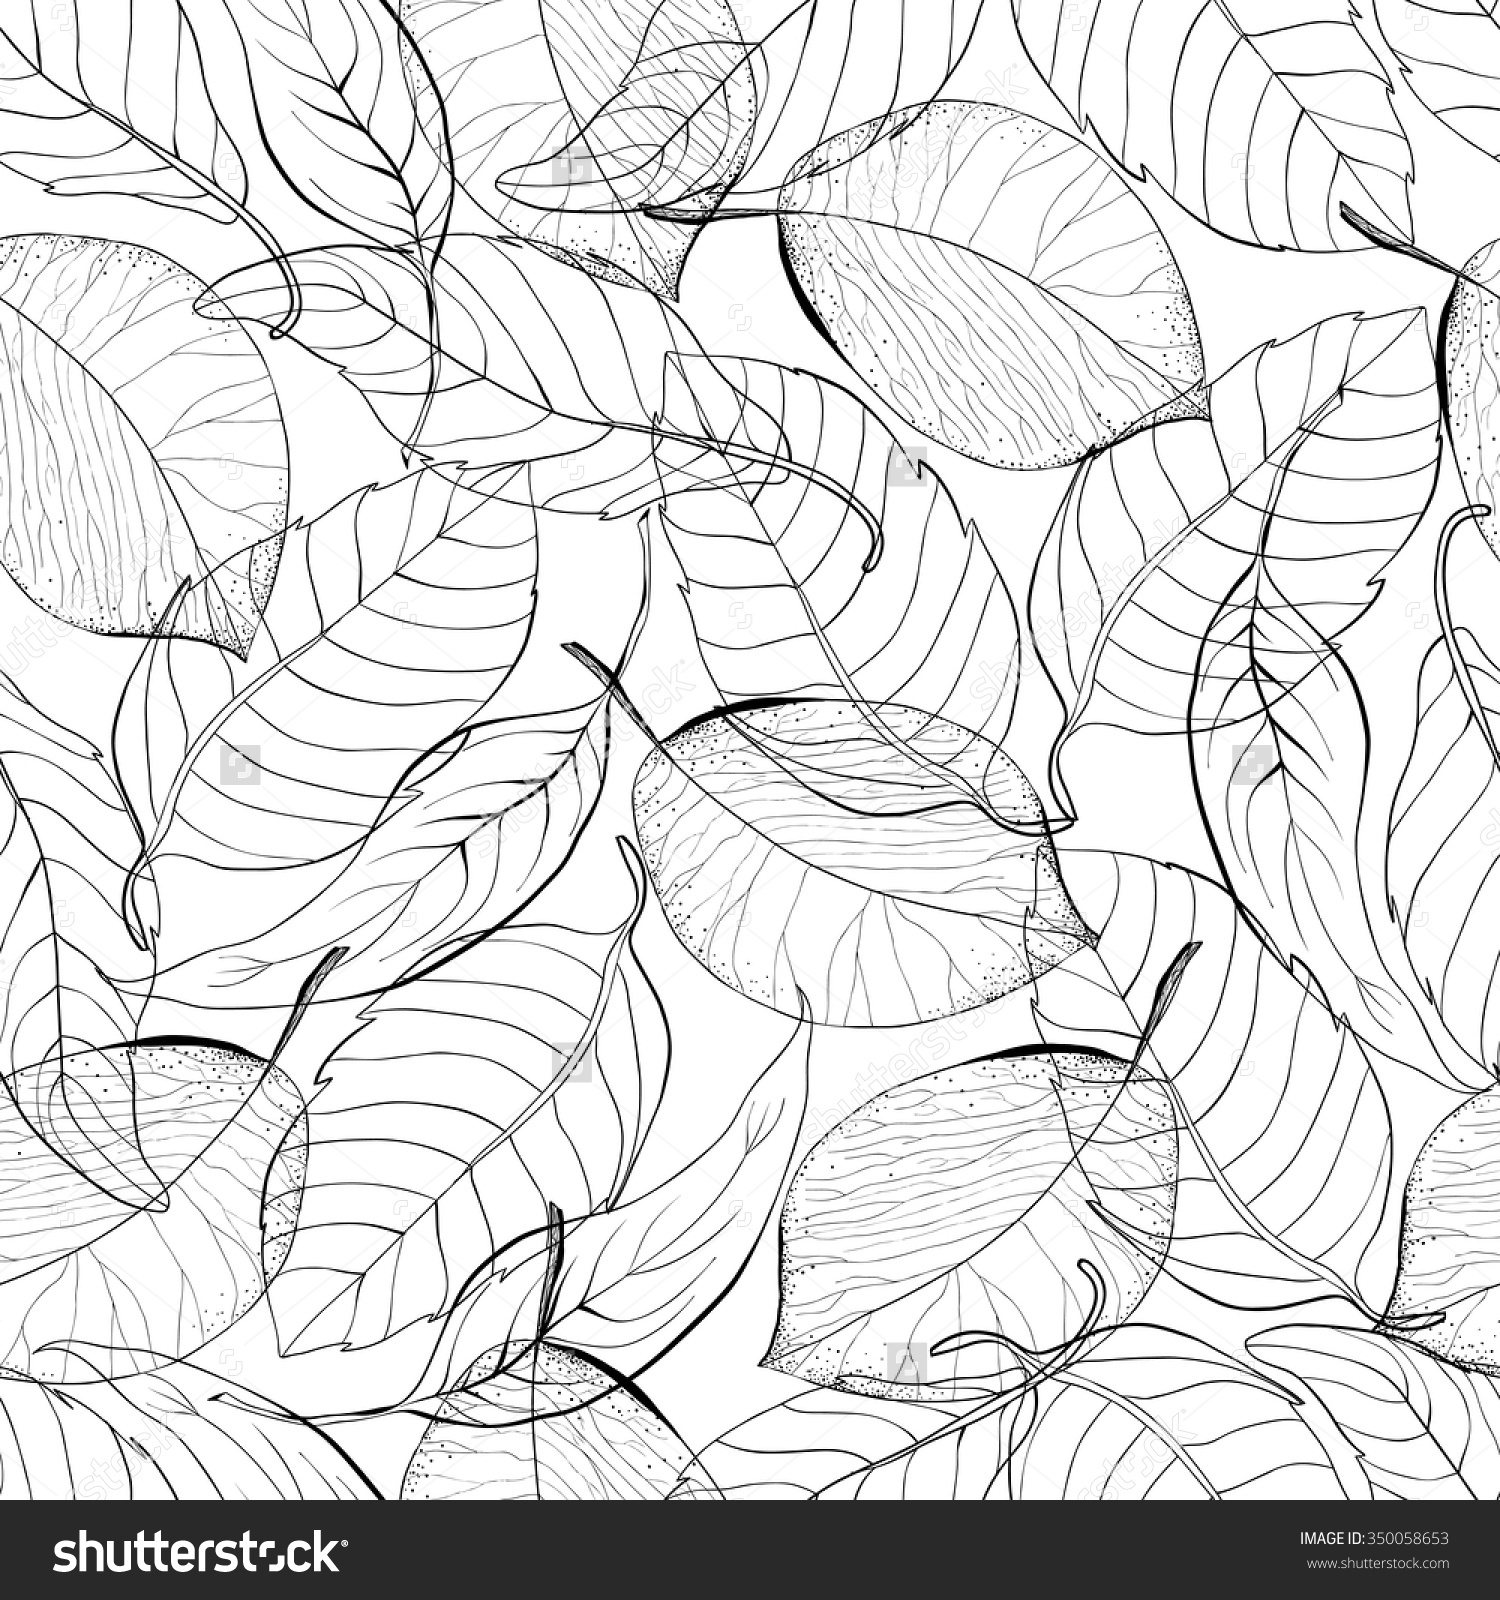 1500x1600 Simple Natural Drawing Pic Natural Scenery Drawing, Simple Natural